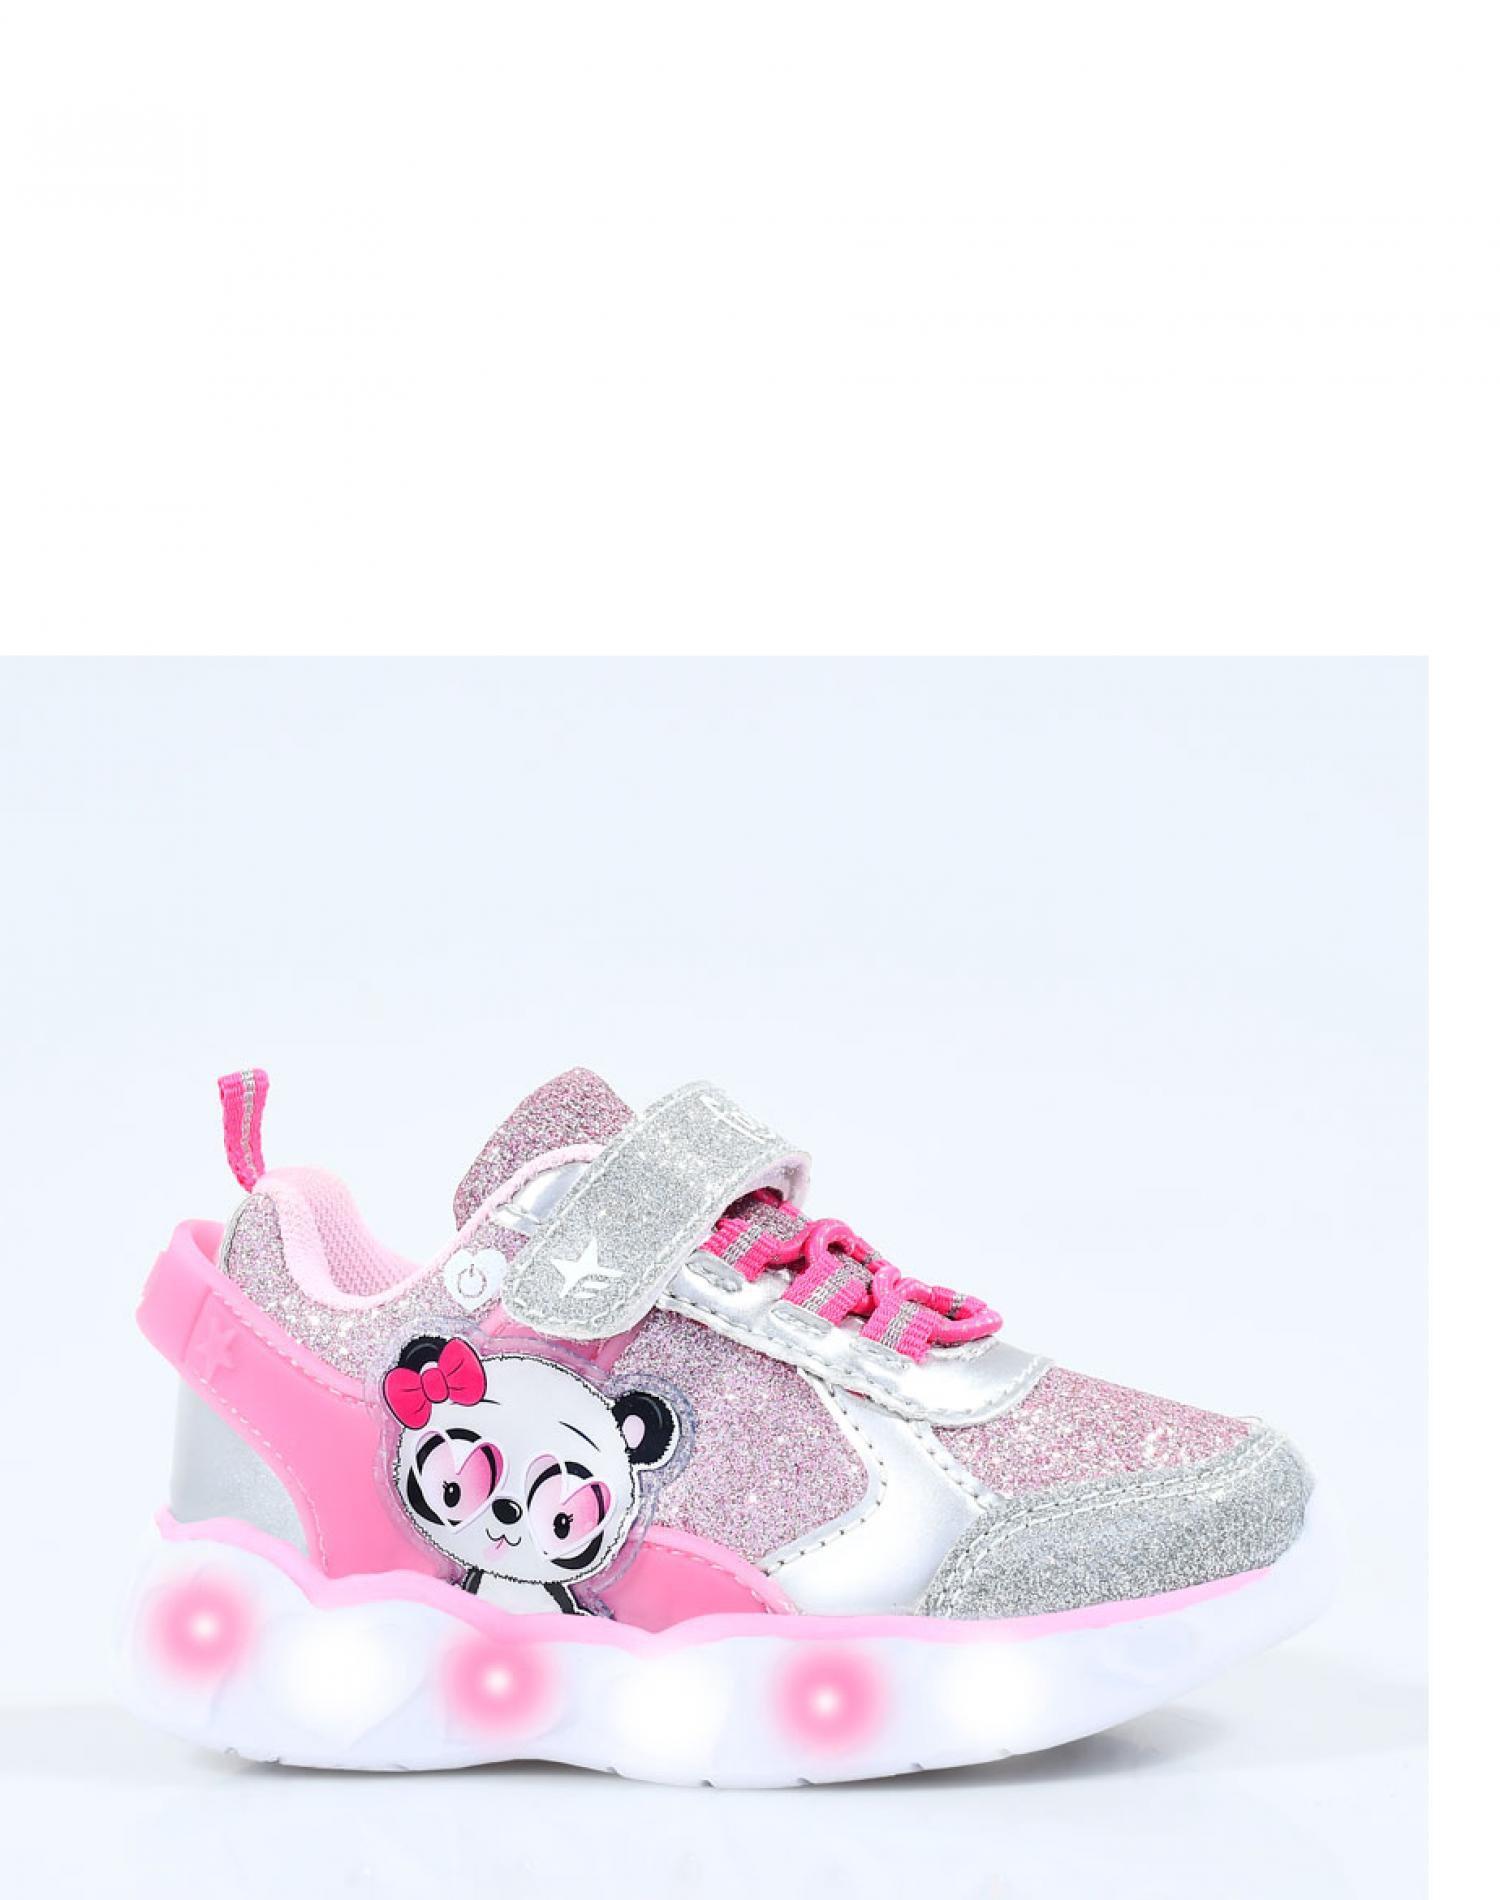 Zapatilla Rosa Footy Panda Luces Funny Store